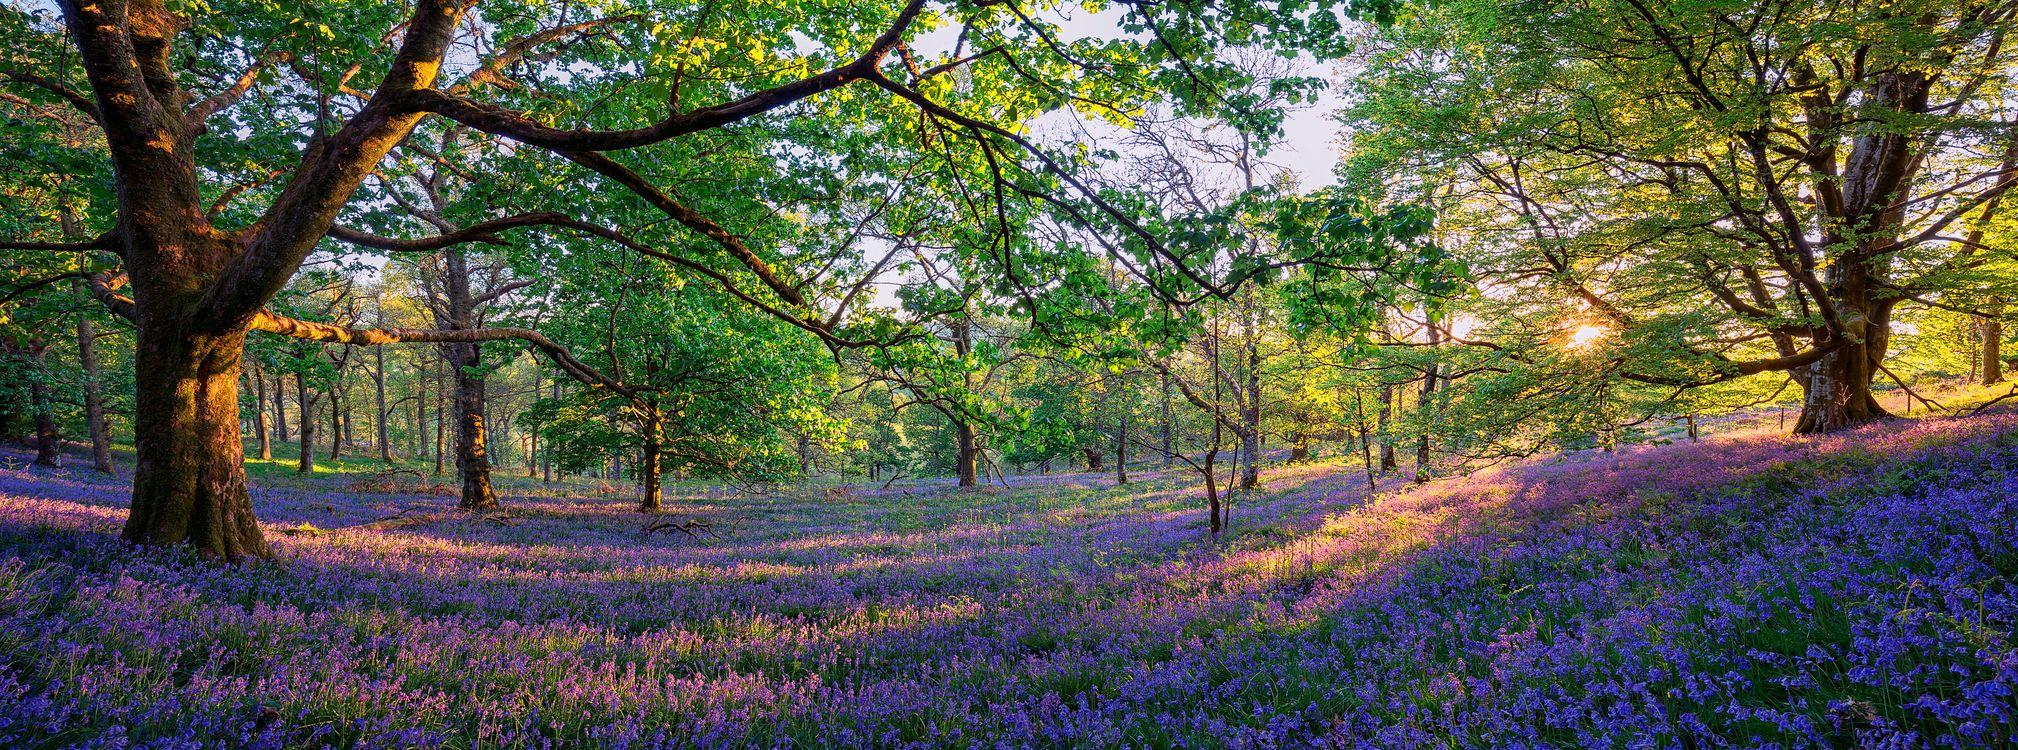 Обои Trossachs, Шотландия, лес, деревья, поляна, цветы, панорама на телефон | картинки пейзажи